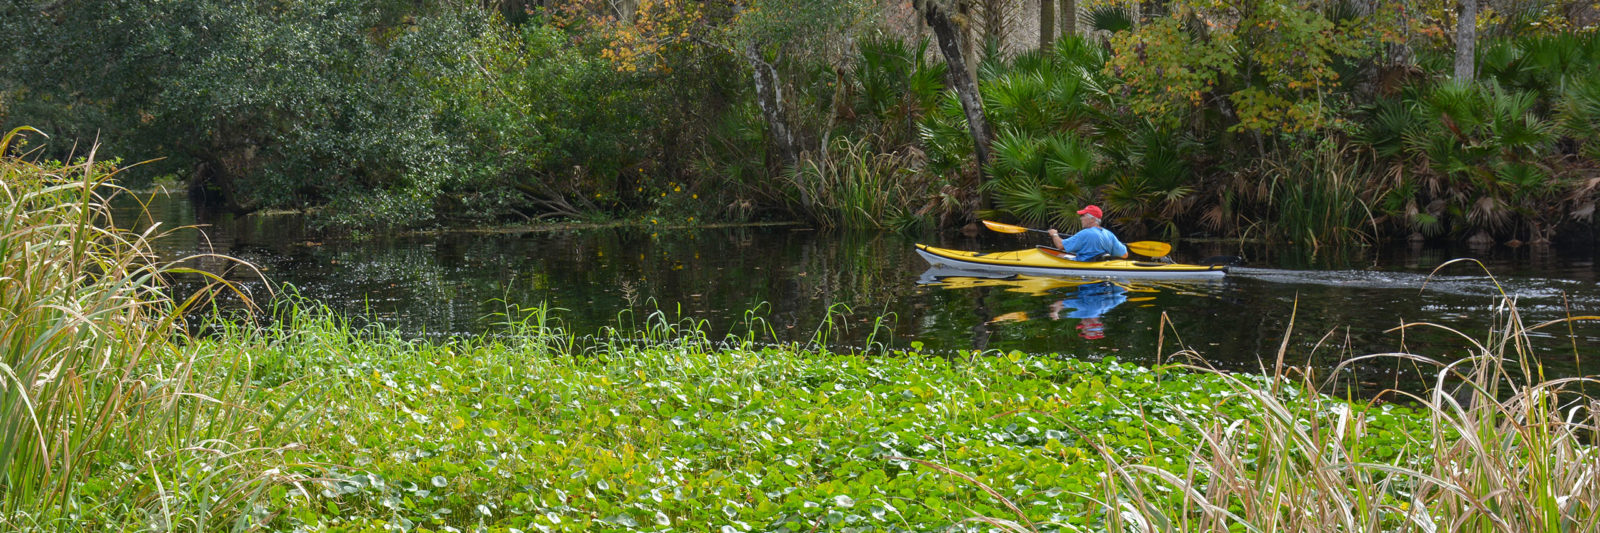 Haw Creek Preserve State Park paddler